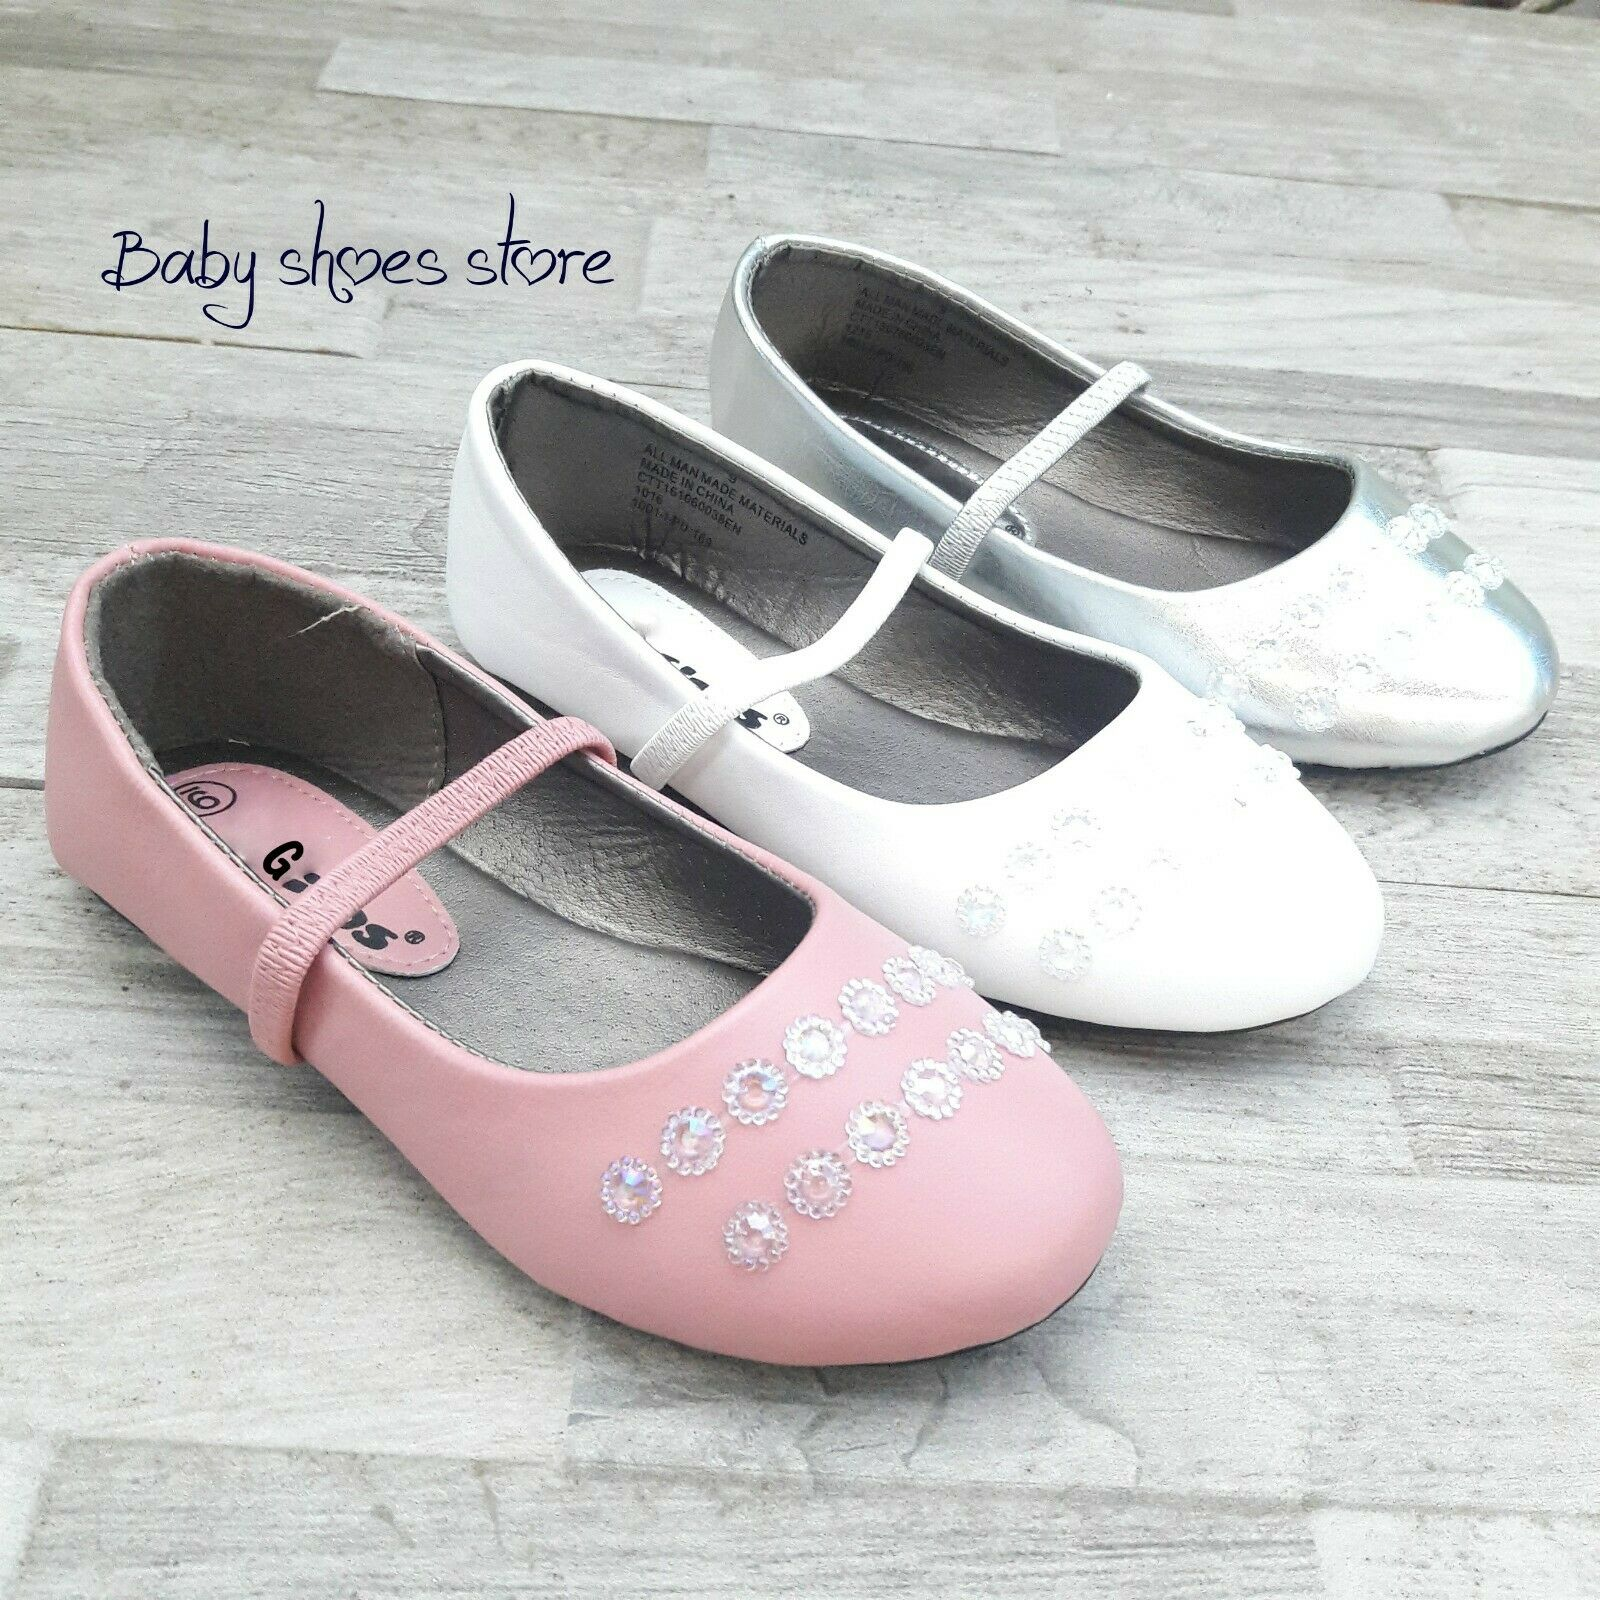 Infant Toddler Girls Ballet Flat Dress Shoes Size 4-9 New